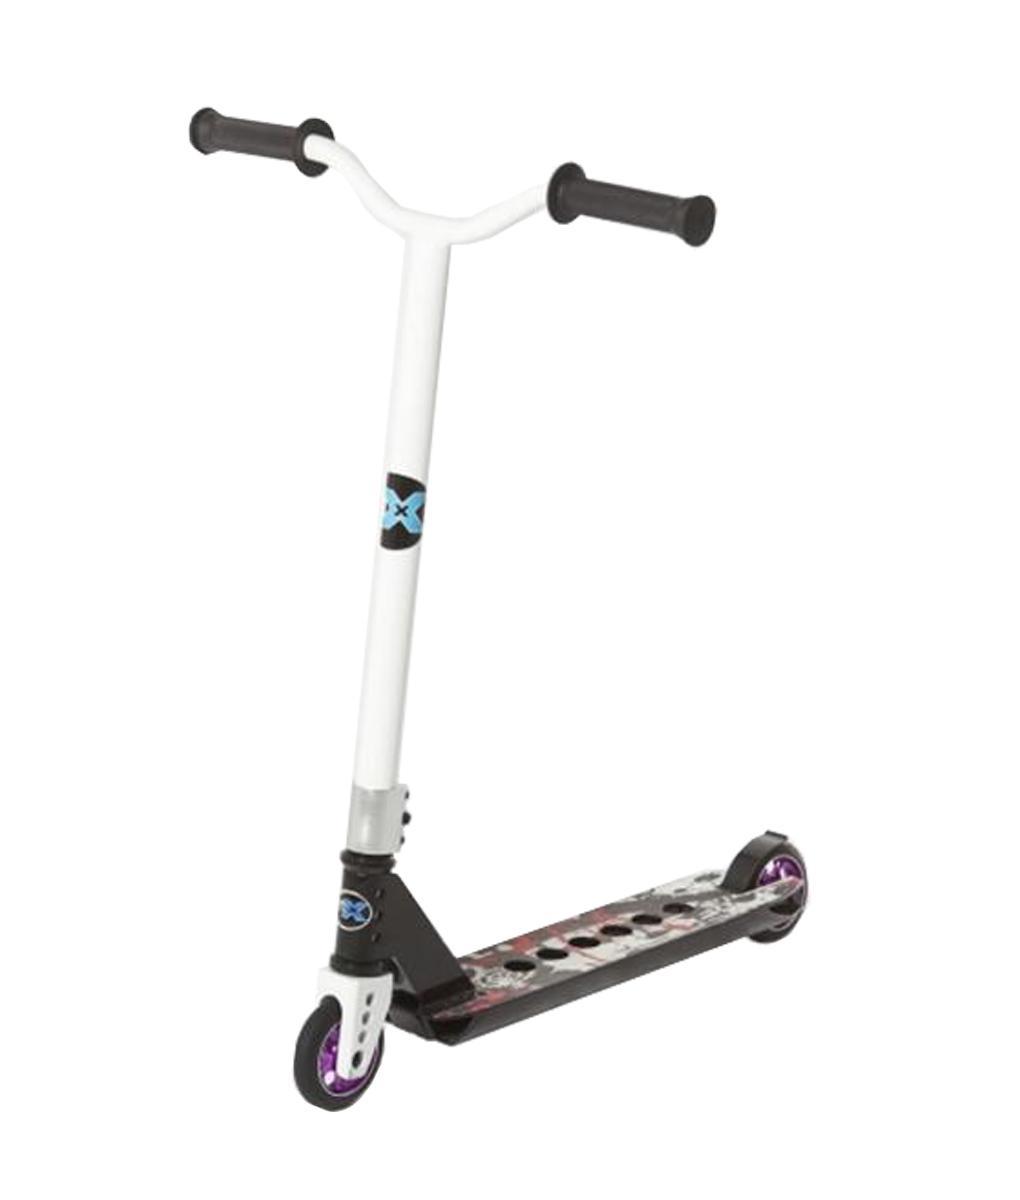 foto patinete stunt scooters micro mx pro opb foto 374593. Black Bedroom Furniture Sets. Home Design Ideas